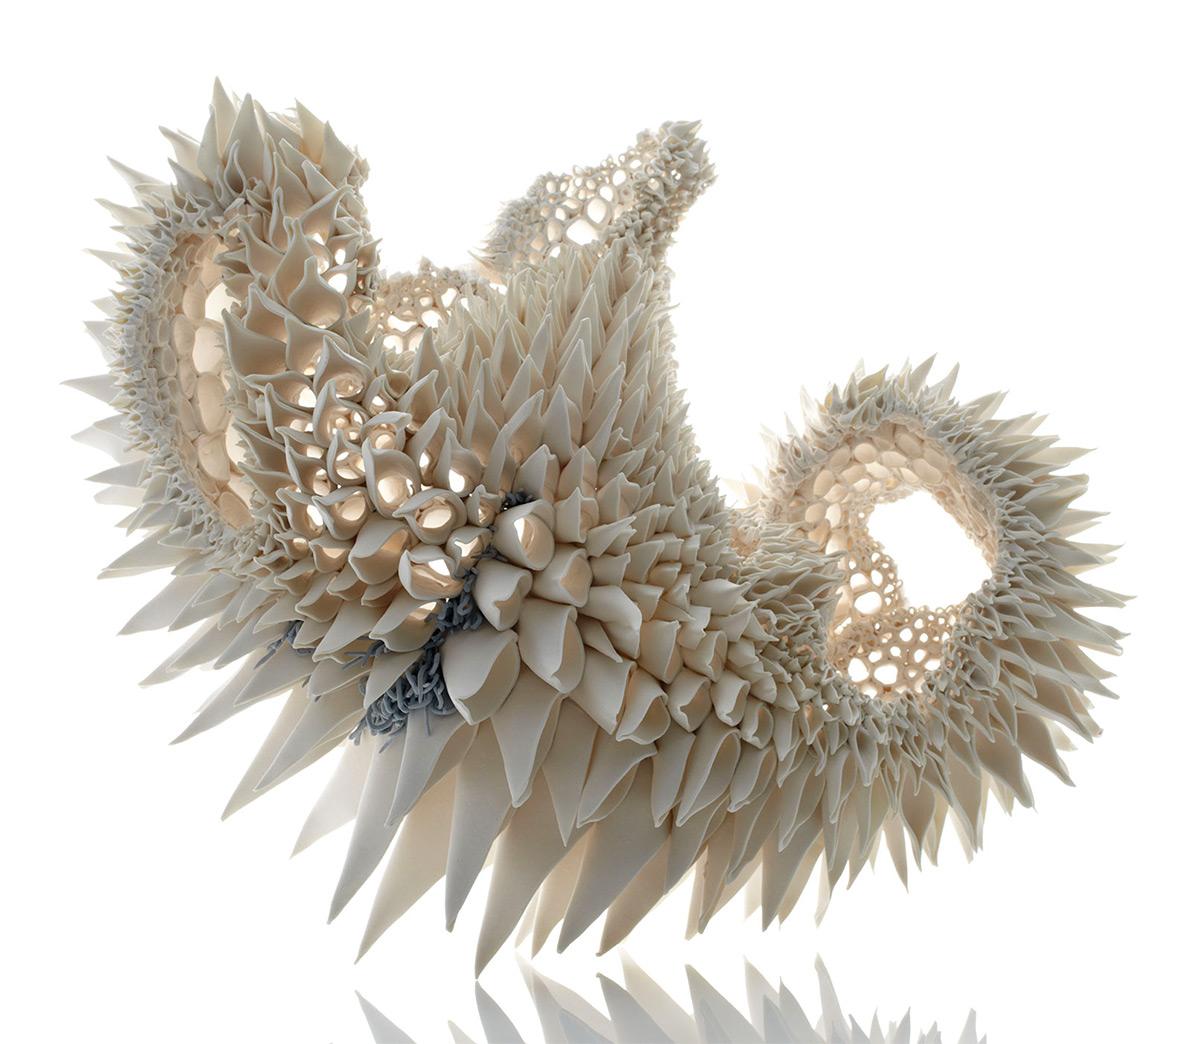 Фрактальные фарфоровые скульптуры Нуалы О